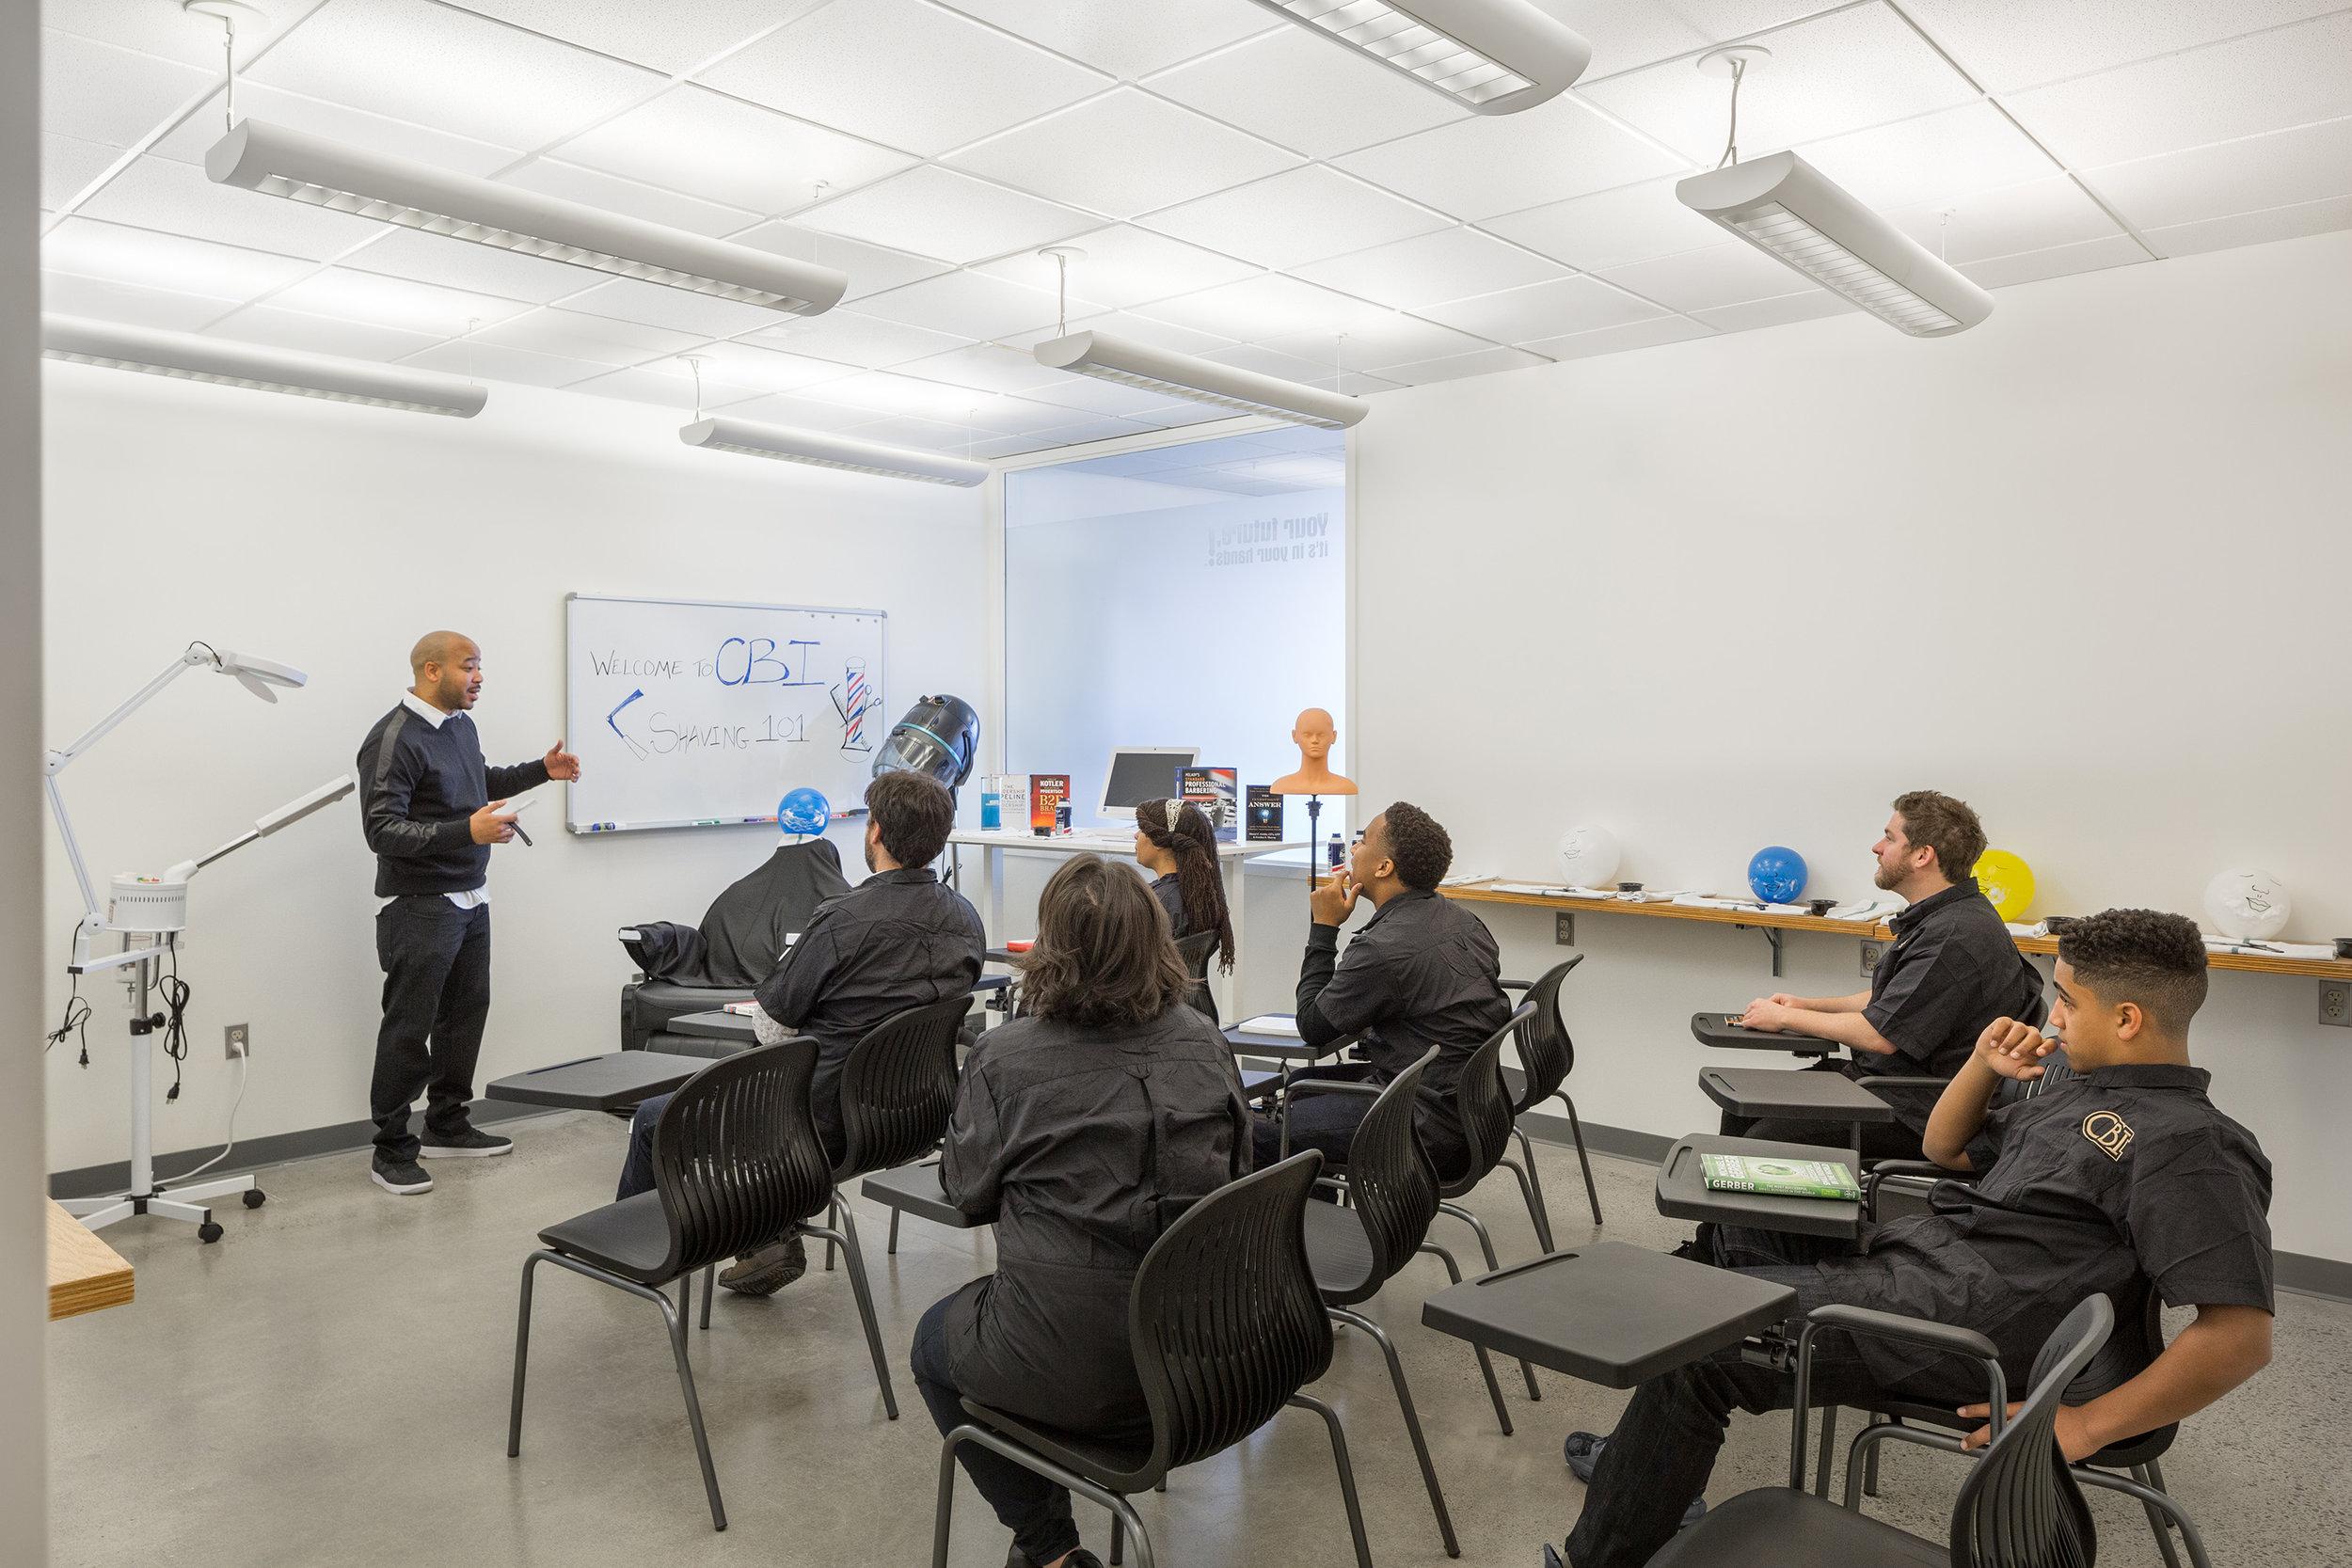 002-Champions-Barber-Institute-Classroom-JoshPartee.jpg